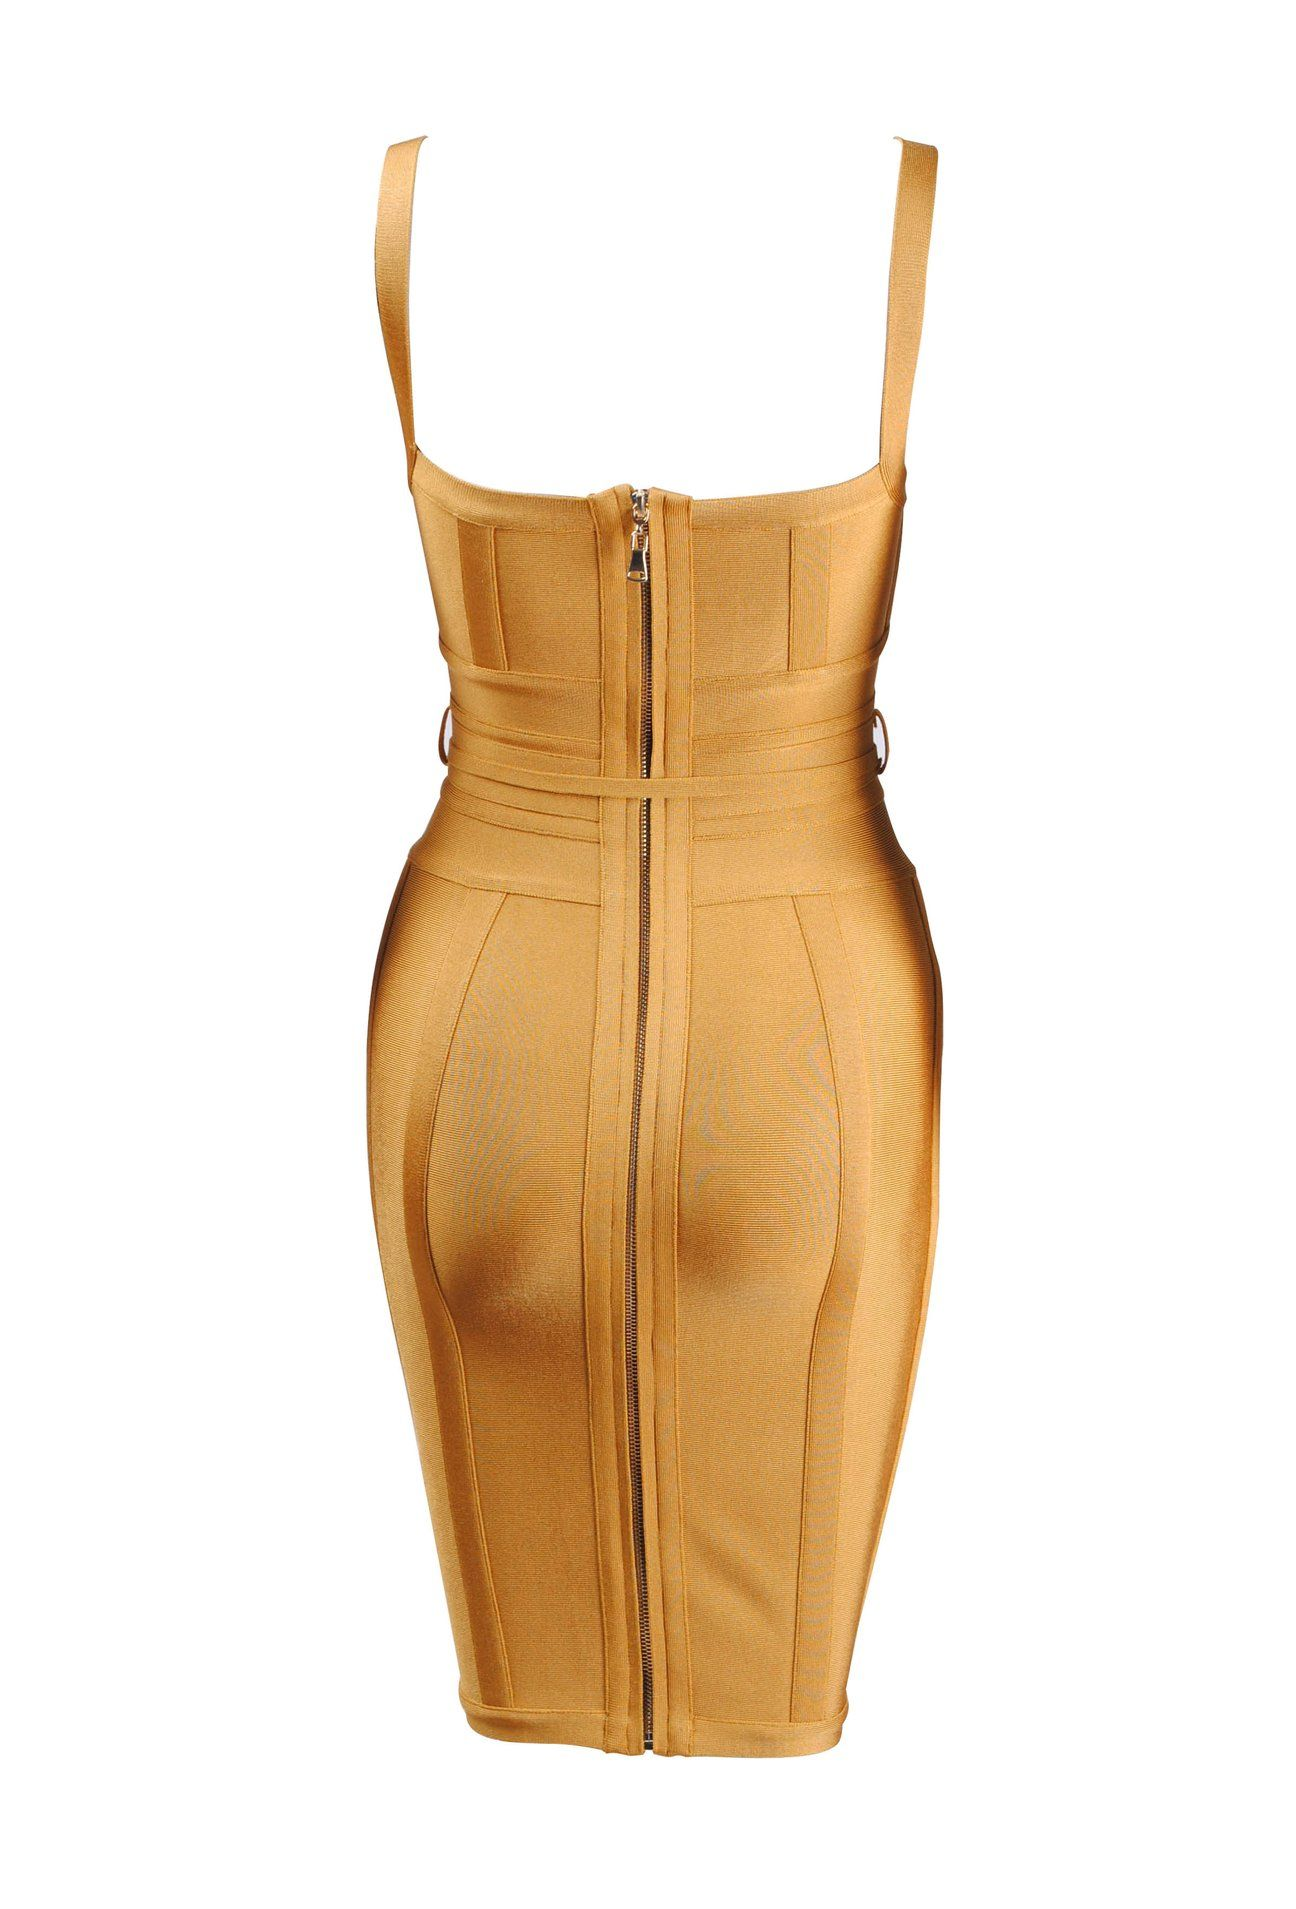 c233ec3ad Women Bandage Dress 2018 Rayon Sleeveless Summer New Arrivals Sexy Deep v  Neck Vestido Bodycon Bandage